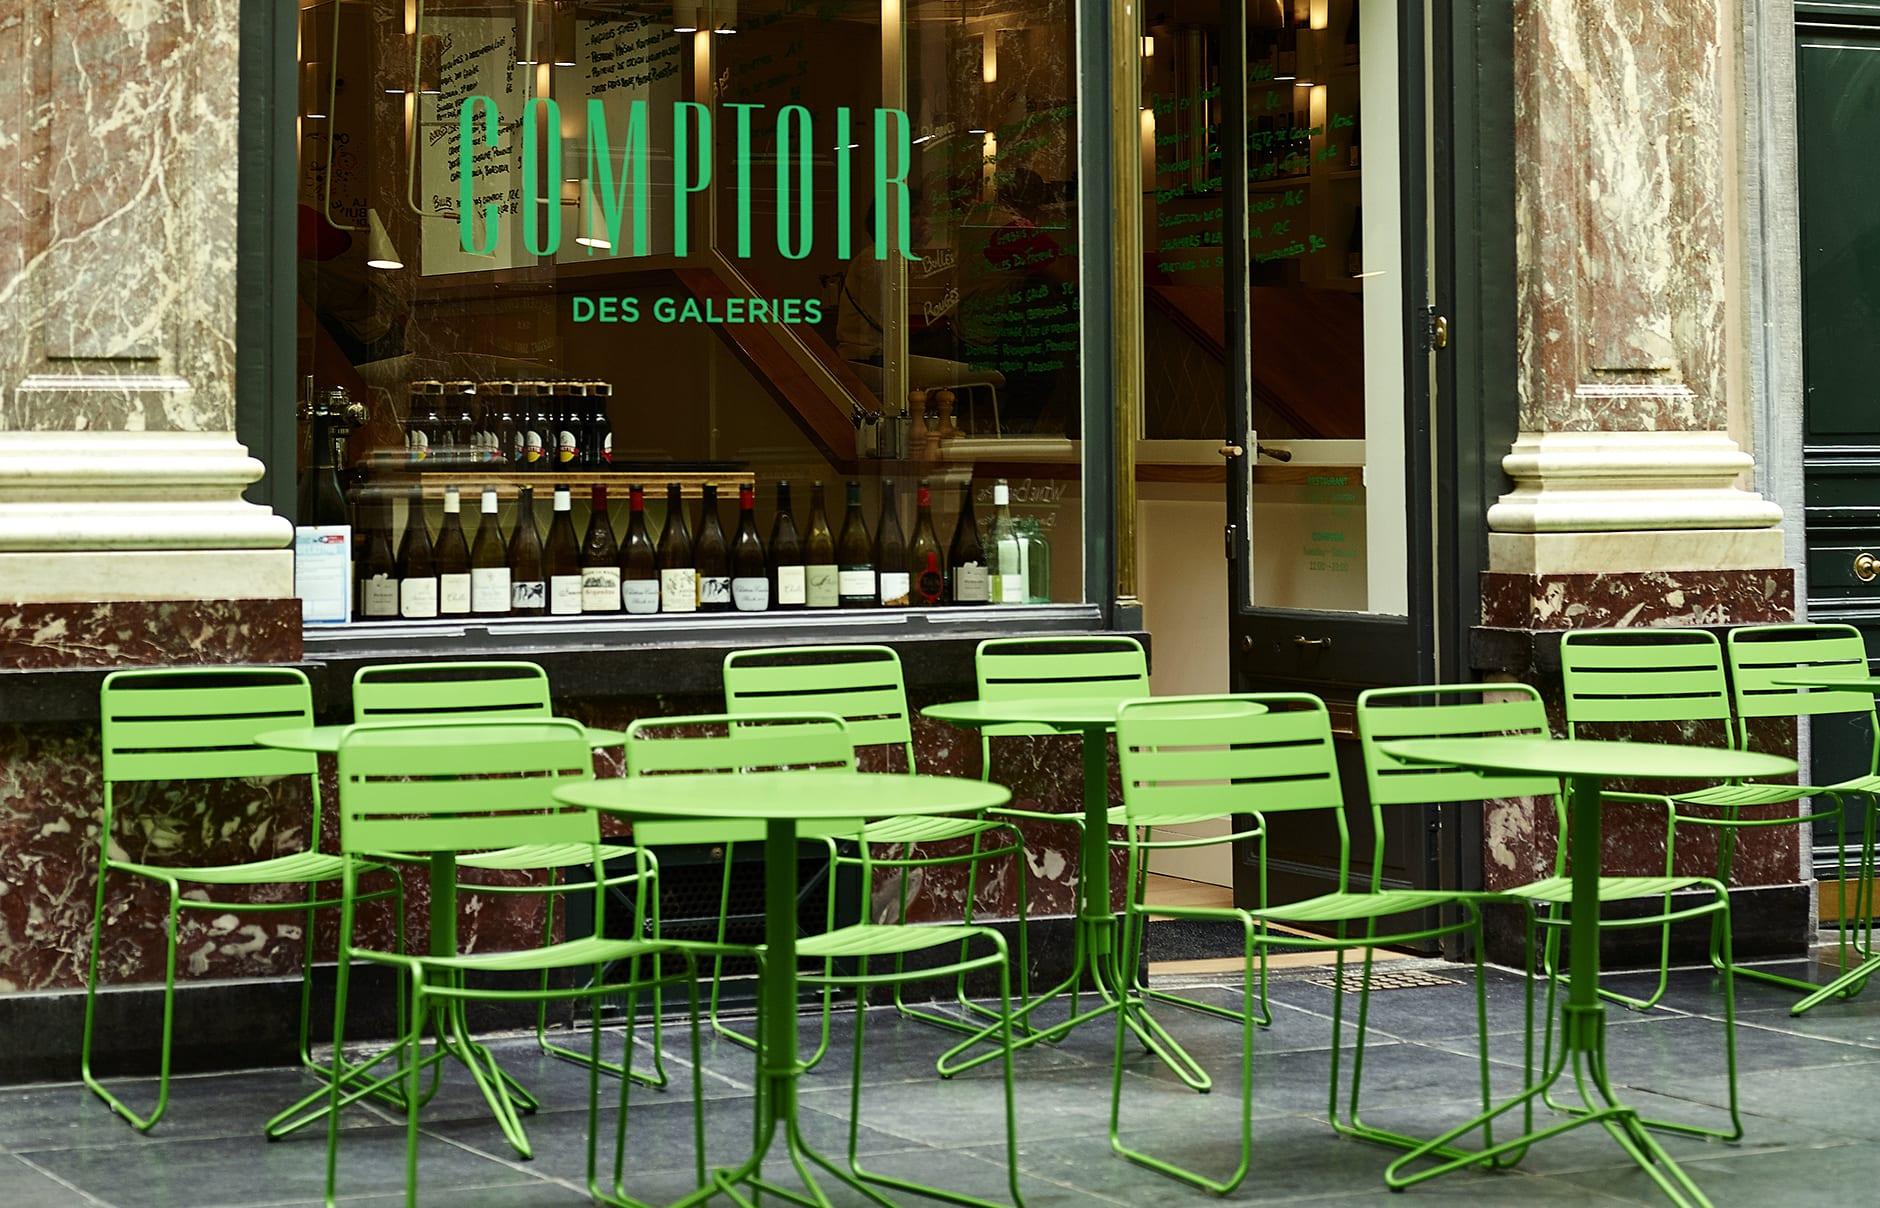 Hôtel des Galeries, Brussels, Belgium. © Hôtel des Galeries